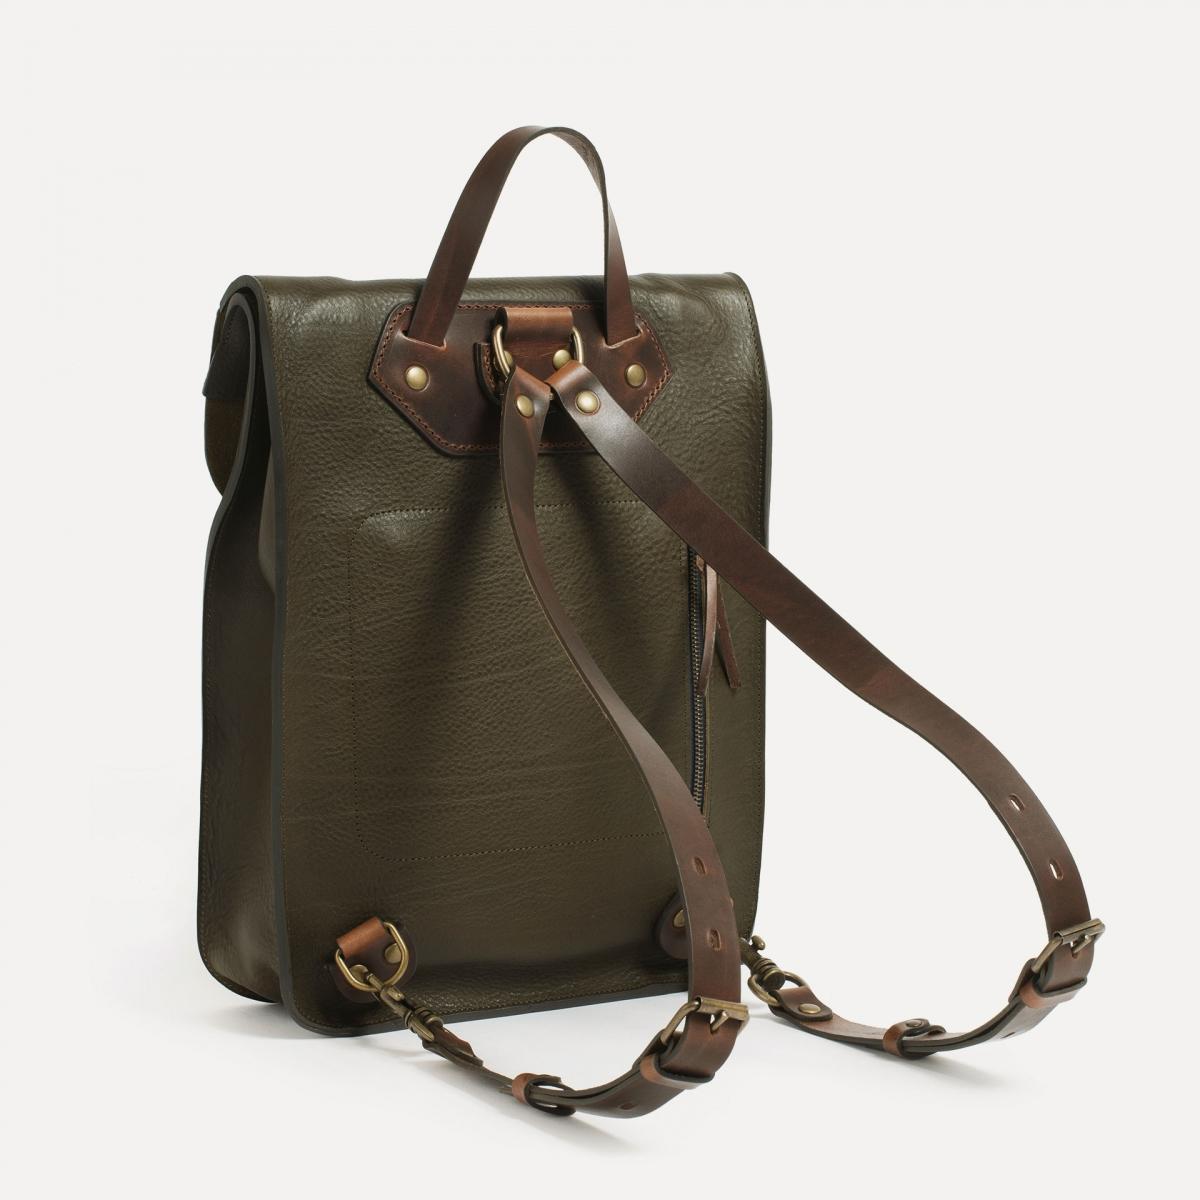 Puncho leather backpack - Khaki / E Pure (image n°3)